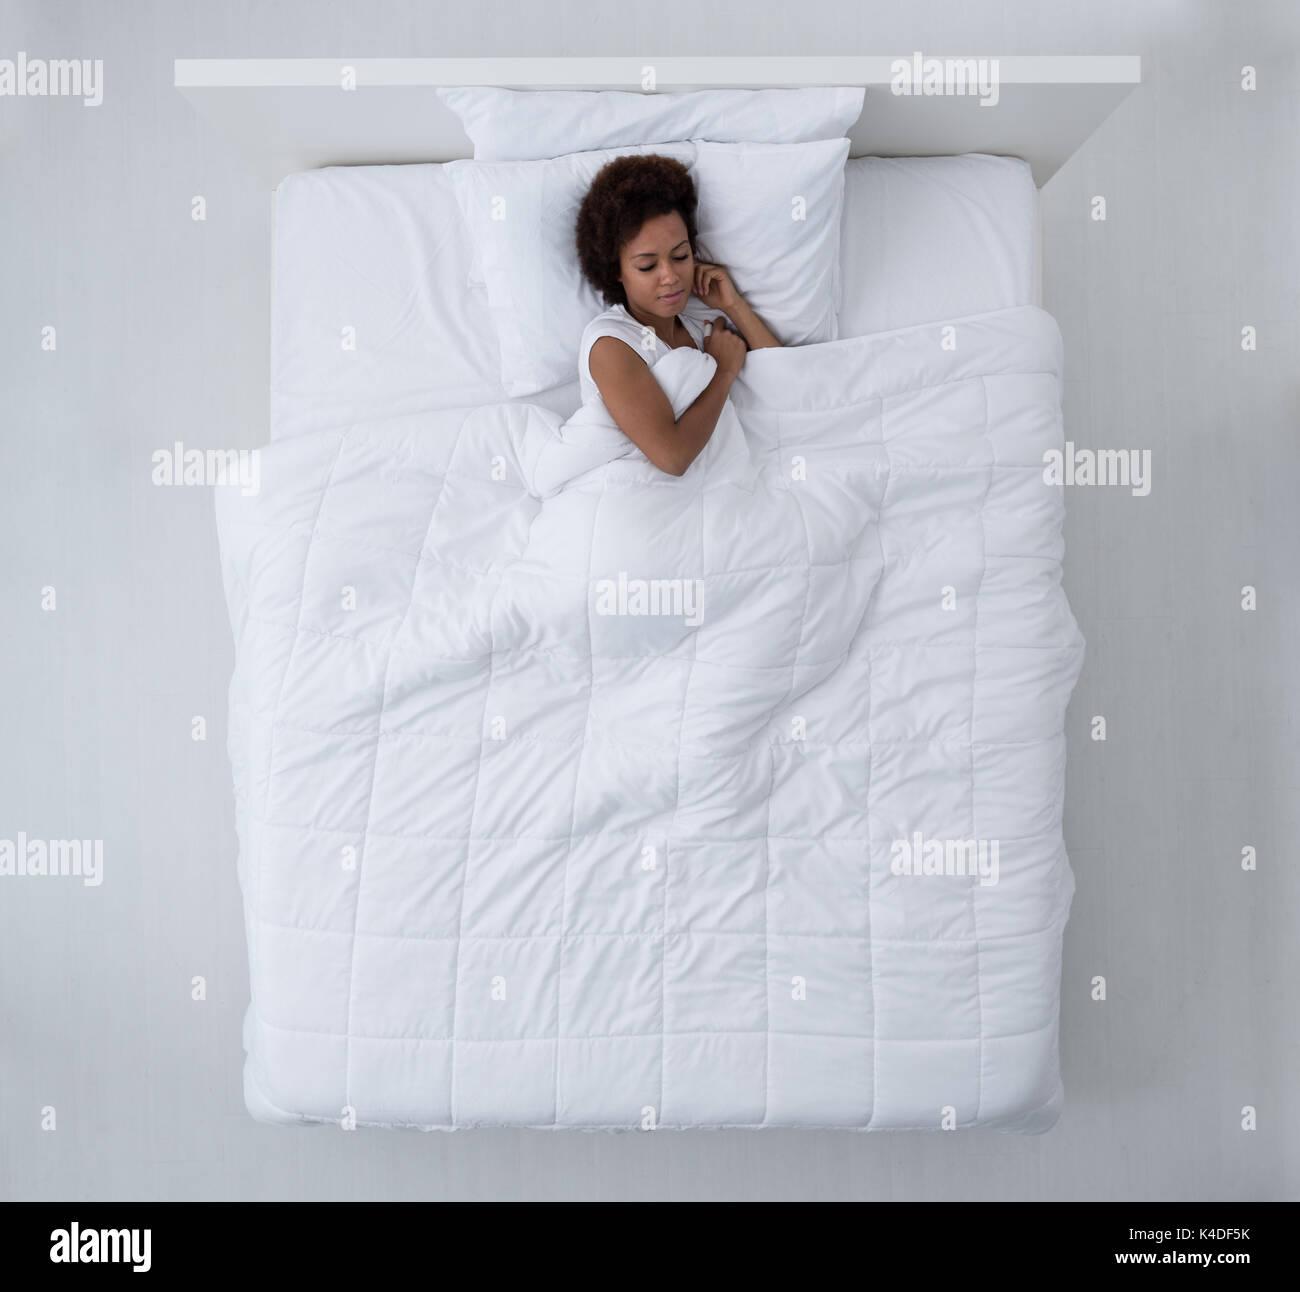 https://c8.alamy.com/comp/K4DF5K/beautiful-african-american-woman-lying-in-bed-and-sleeping-top-view-K4DF5K.jpg